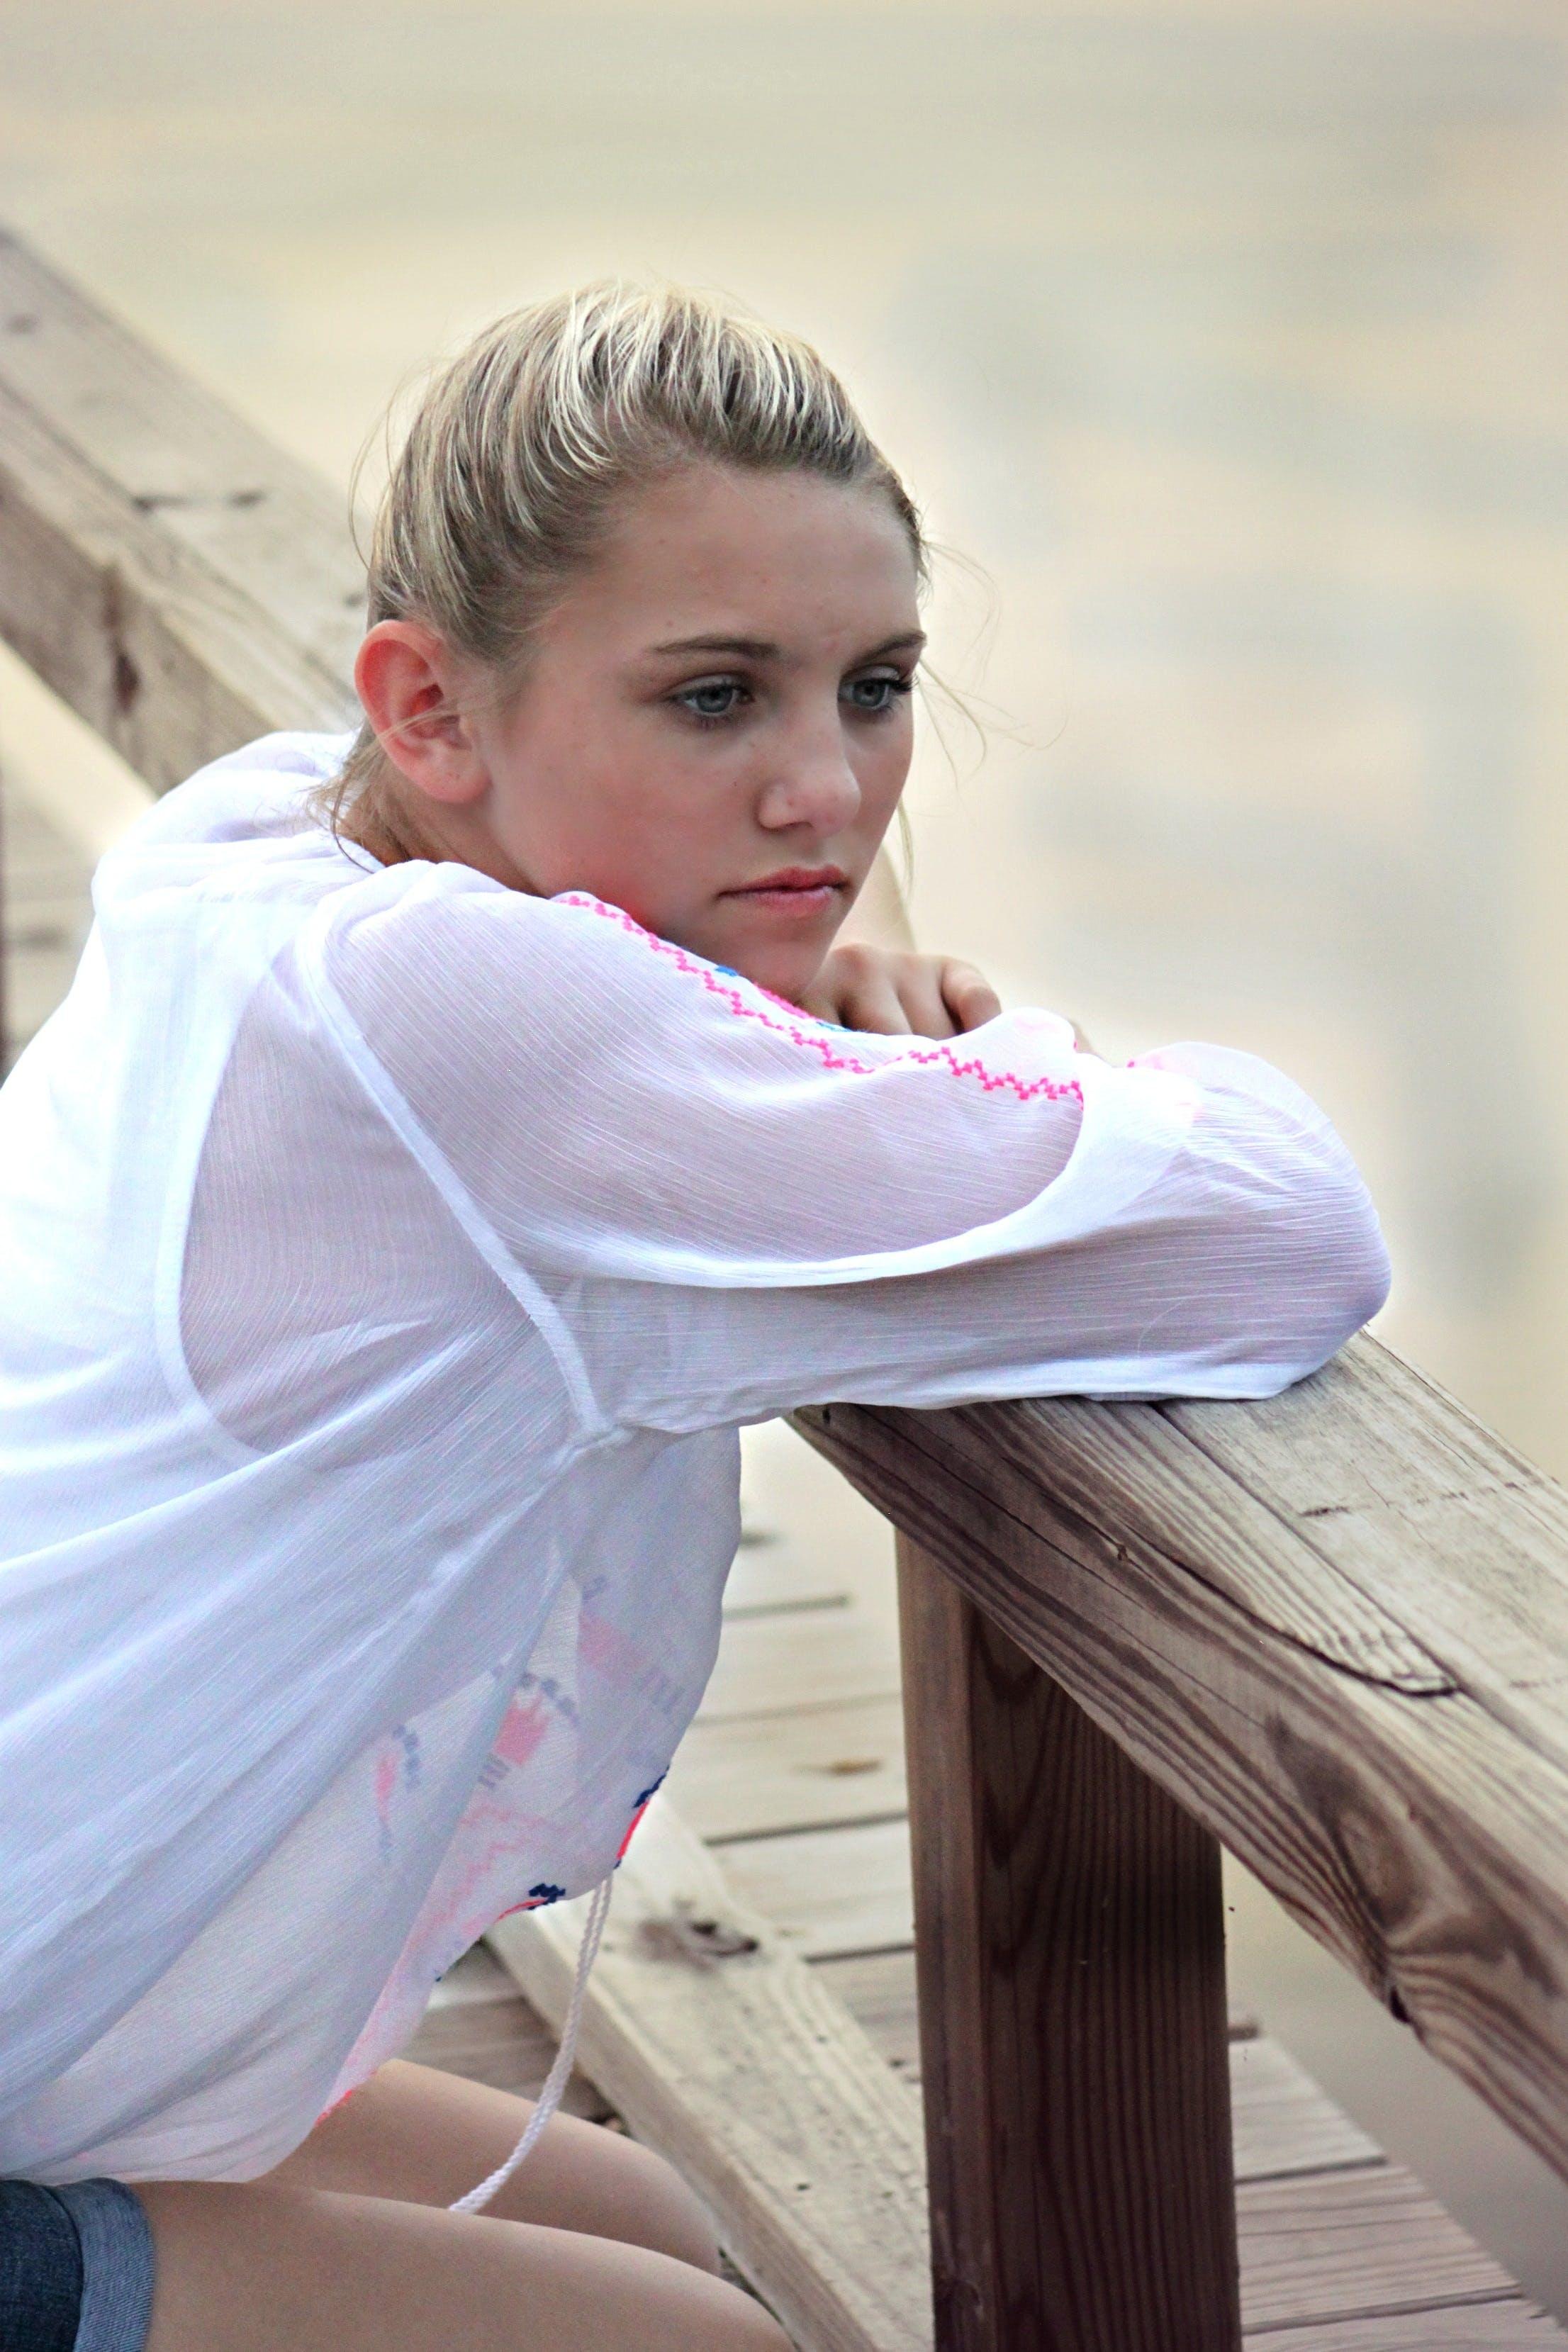 Woman on White Sweatshirt Leaning on Brown Wooden Bridge Frame